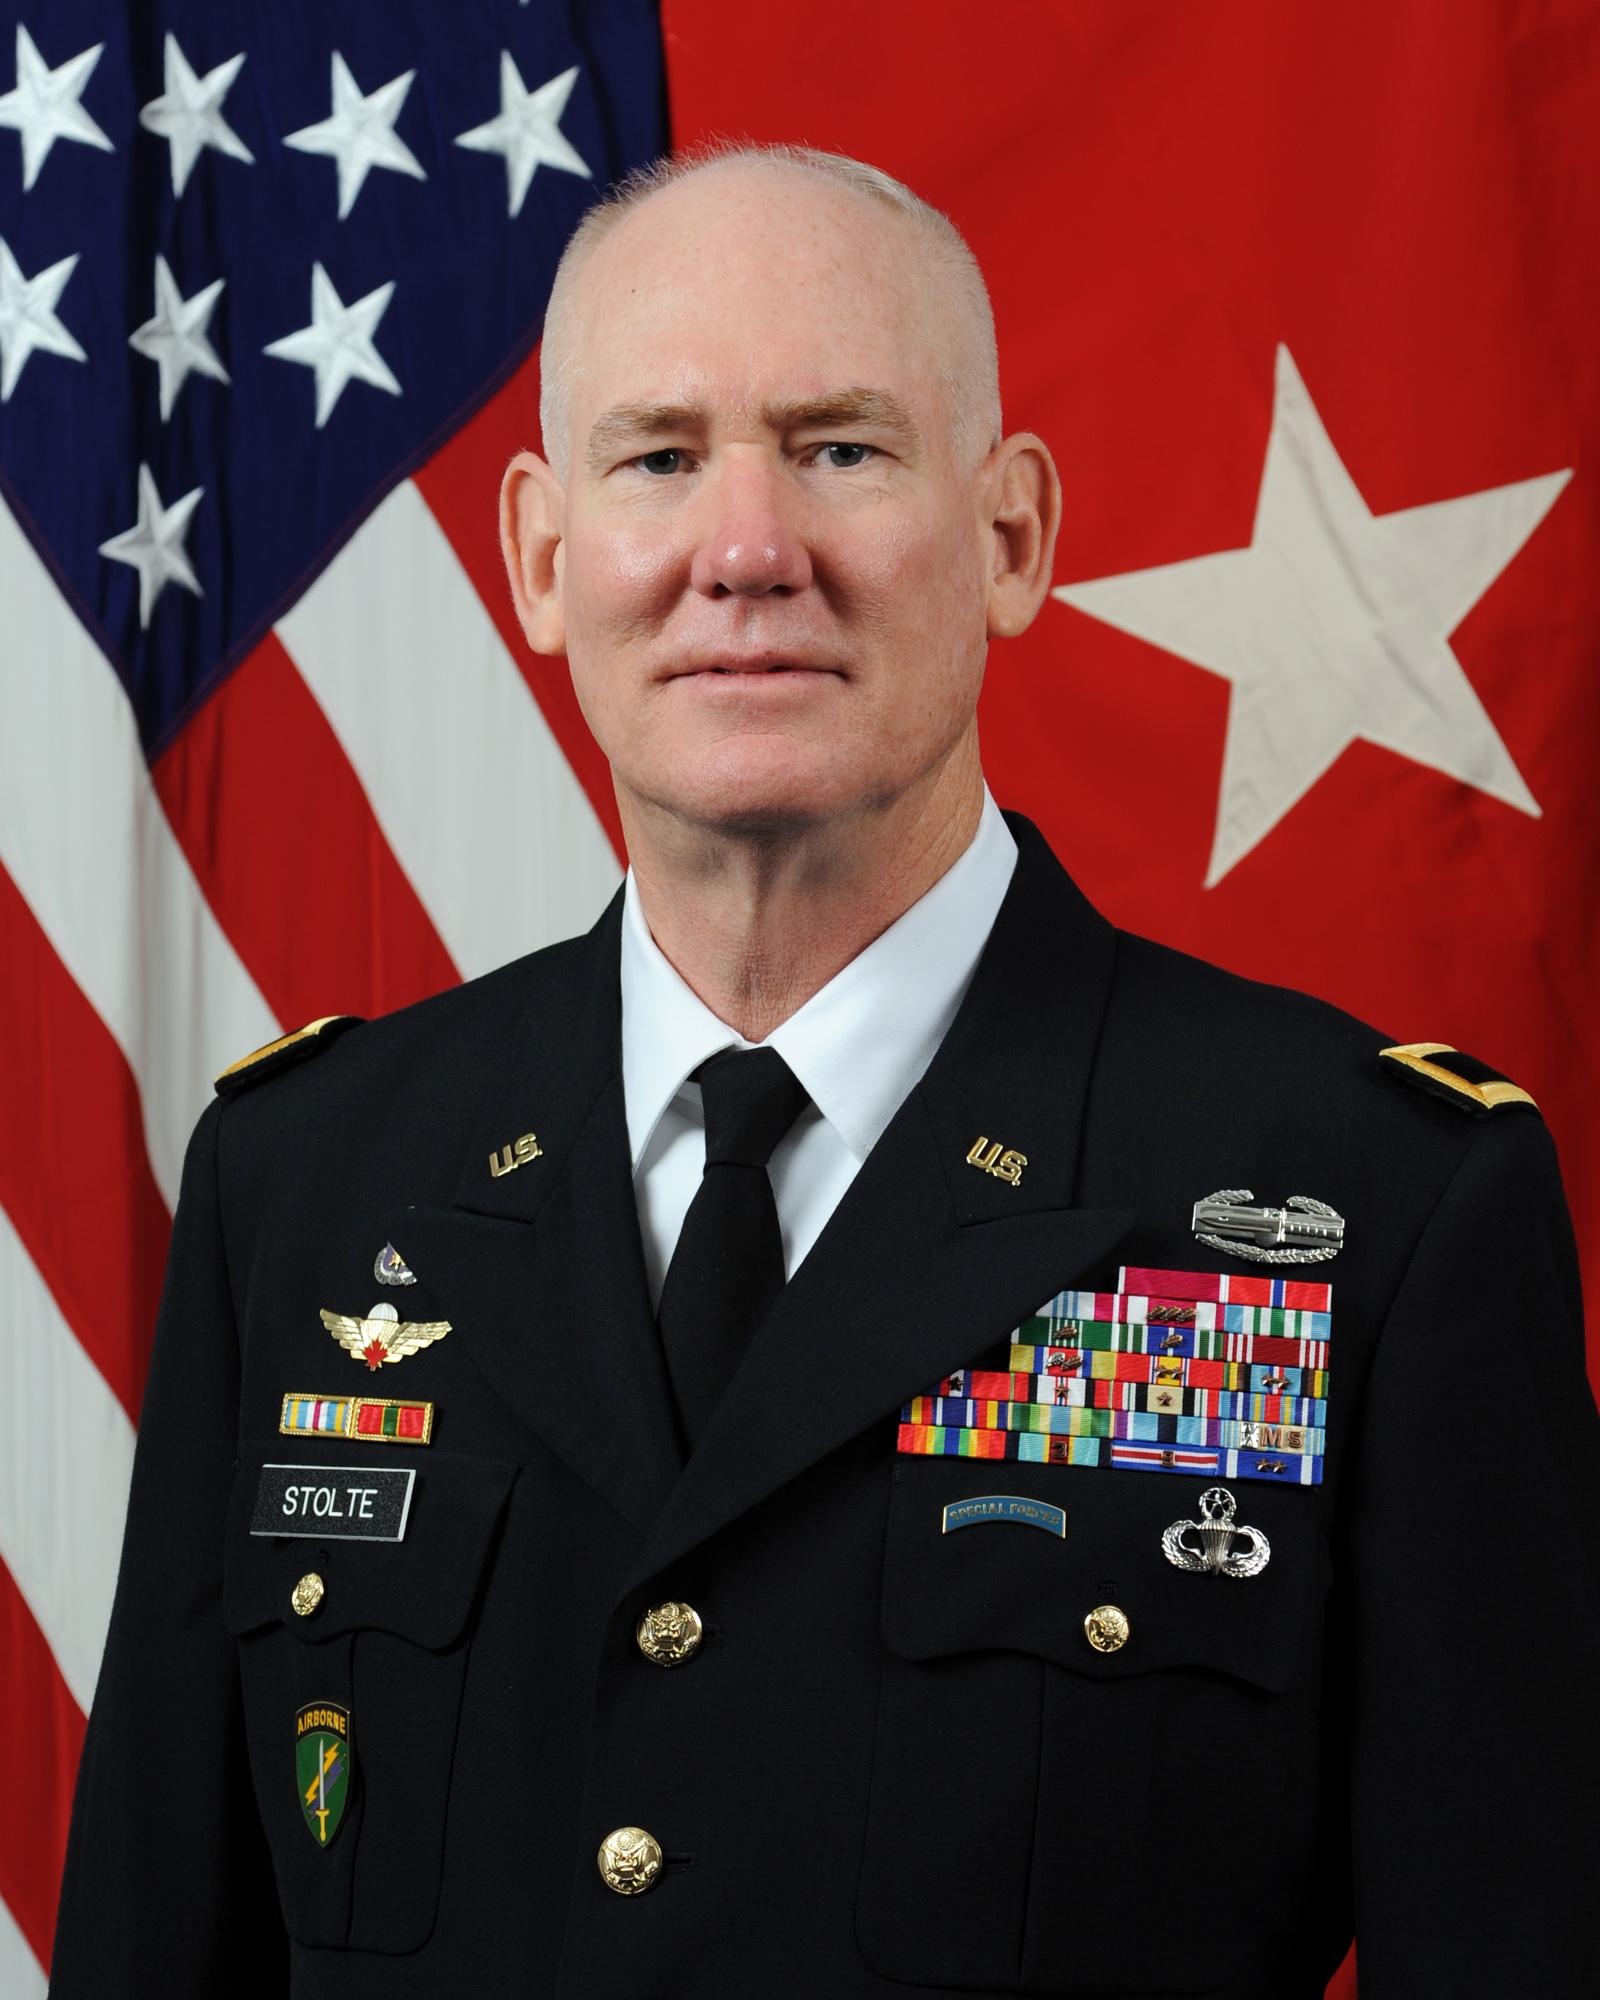 Brigadier General Alan L Stolte & Gt Us Army Reserve